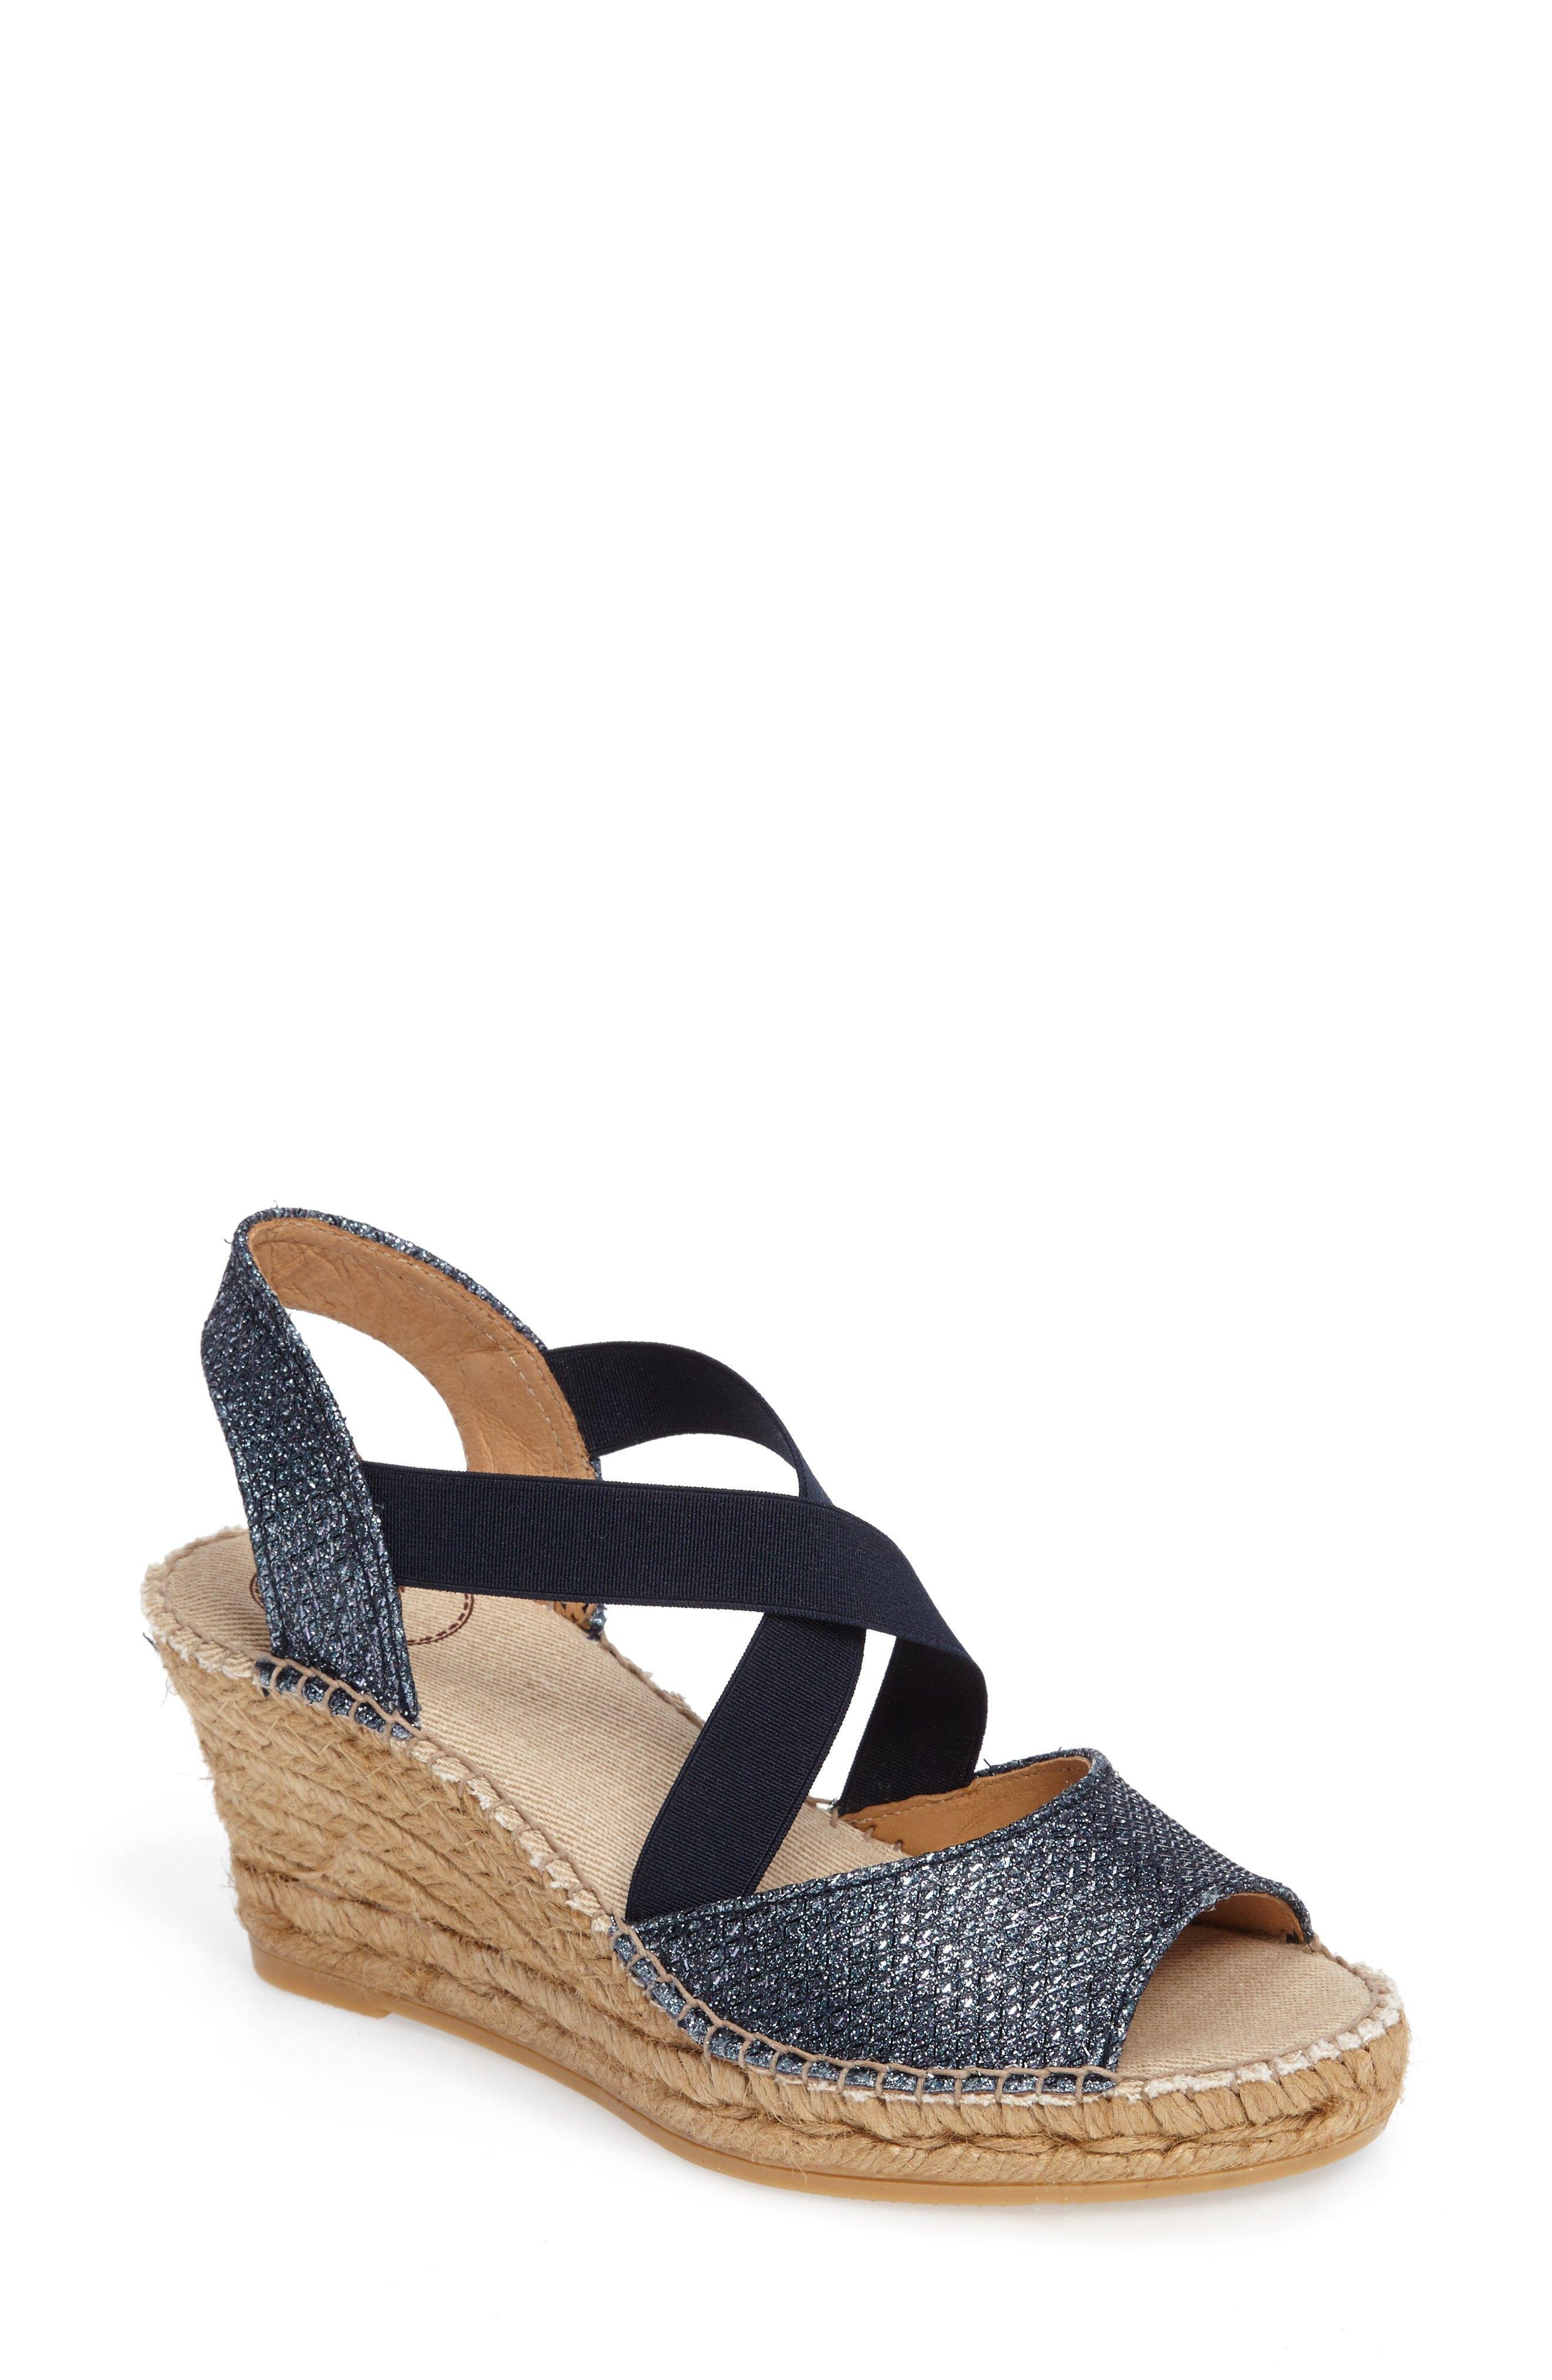 Toni Pons Women's Sol Wedge Espadrille Sandal 0flq5yQa9